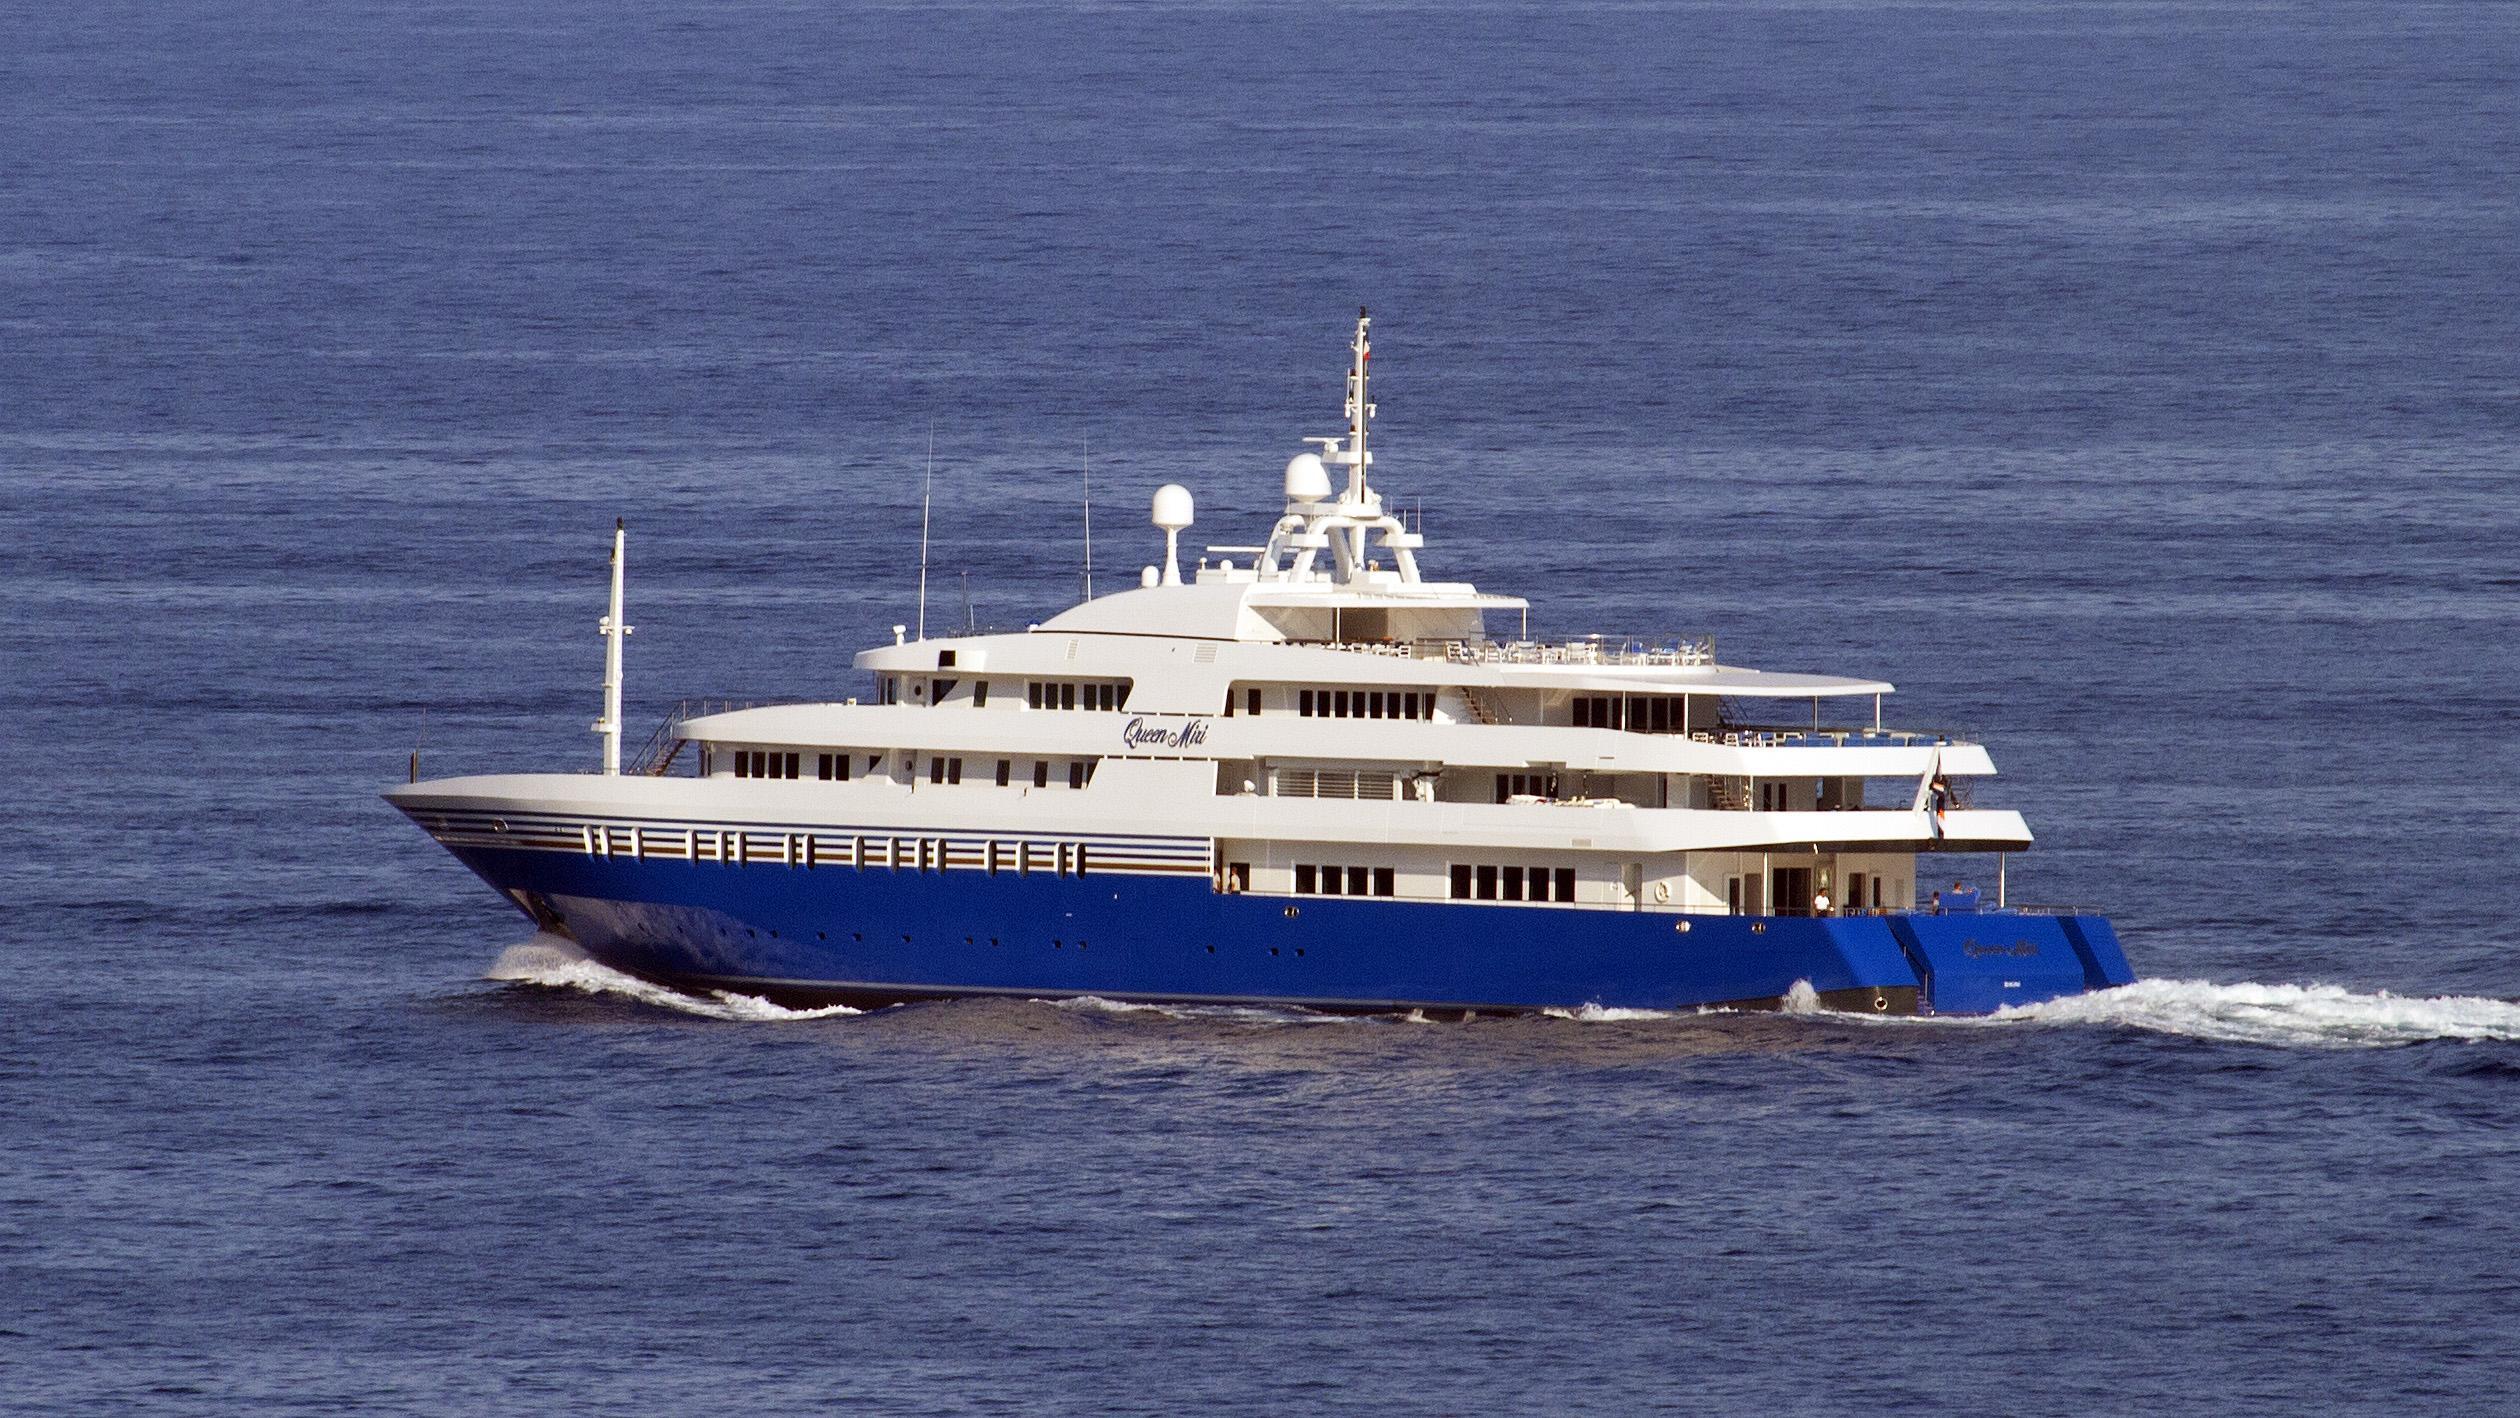 queen-miri-motor-yacht-neorion-2004-91m-running-new-profile